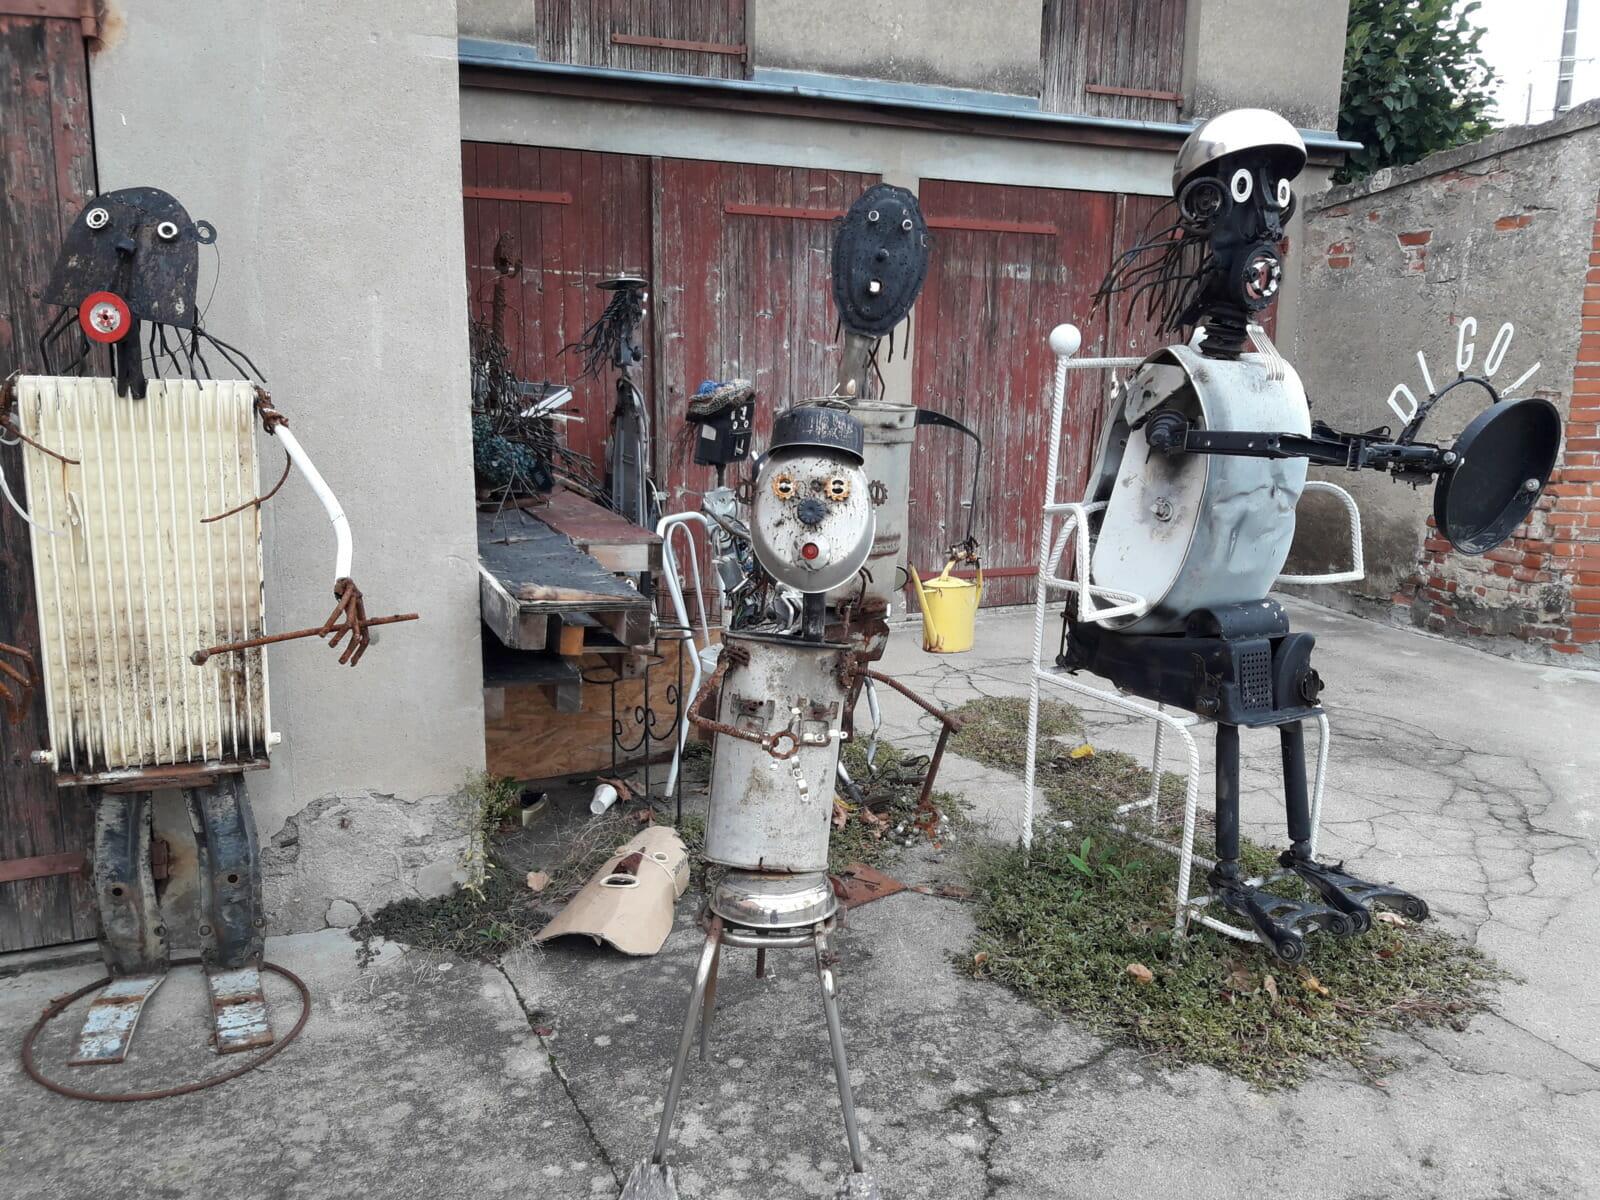 Sculptures made of scrap